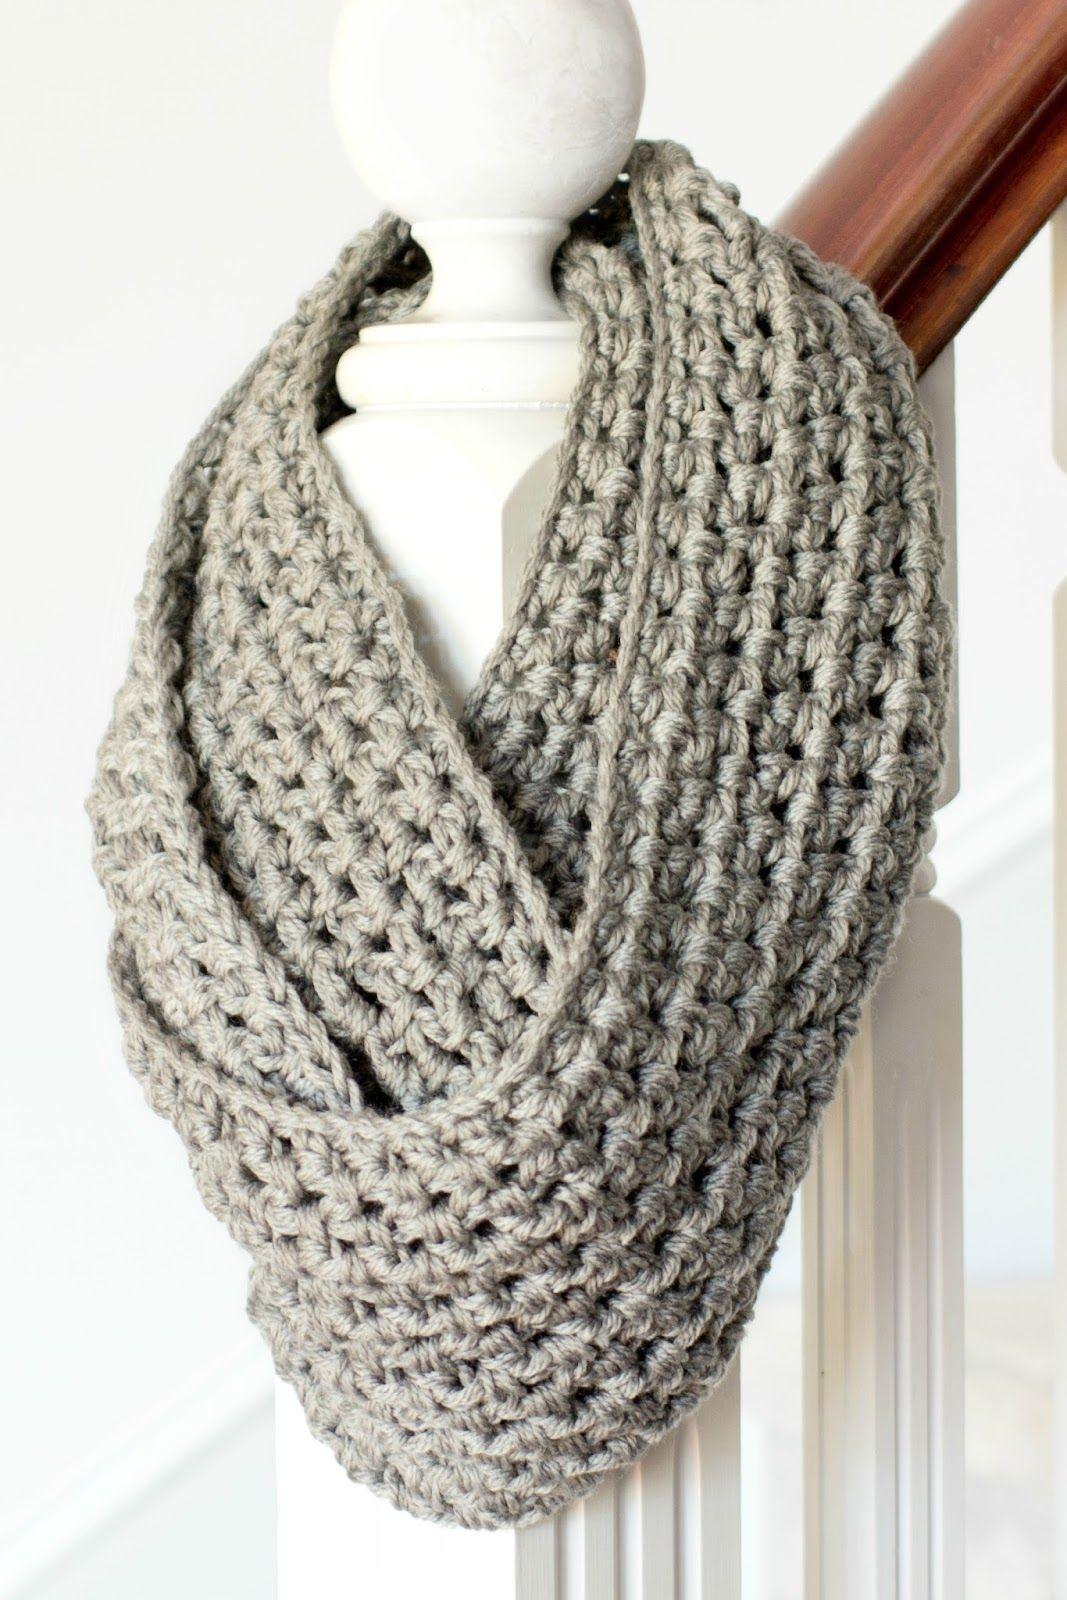 Basic Chunky Infinity Scarf Crochet Pattern | Neck Dec | Crochet - Free Printable Crochet Scarf Patterns